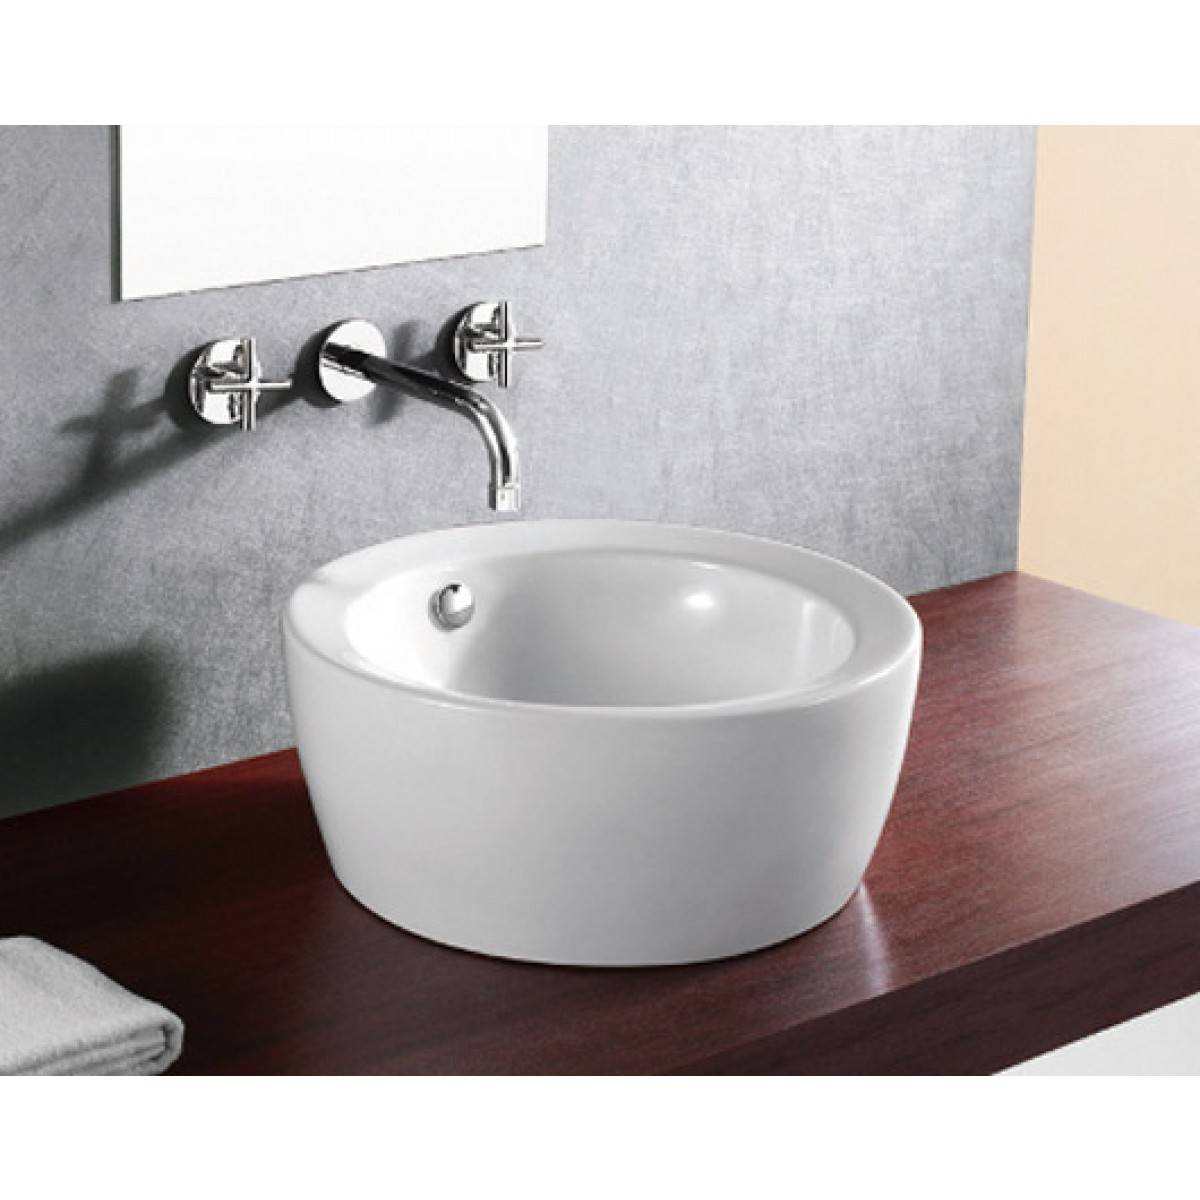 Sink Countertop Bathroom: Round Porcelain Ceramic Countertop Bathroom Vessel Sink